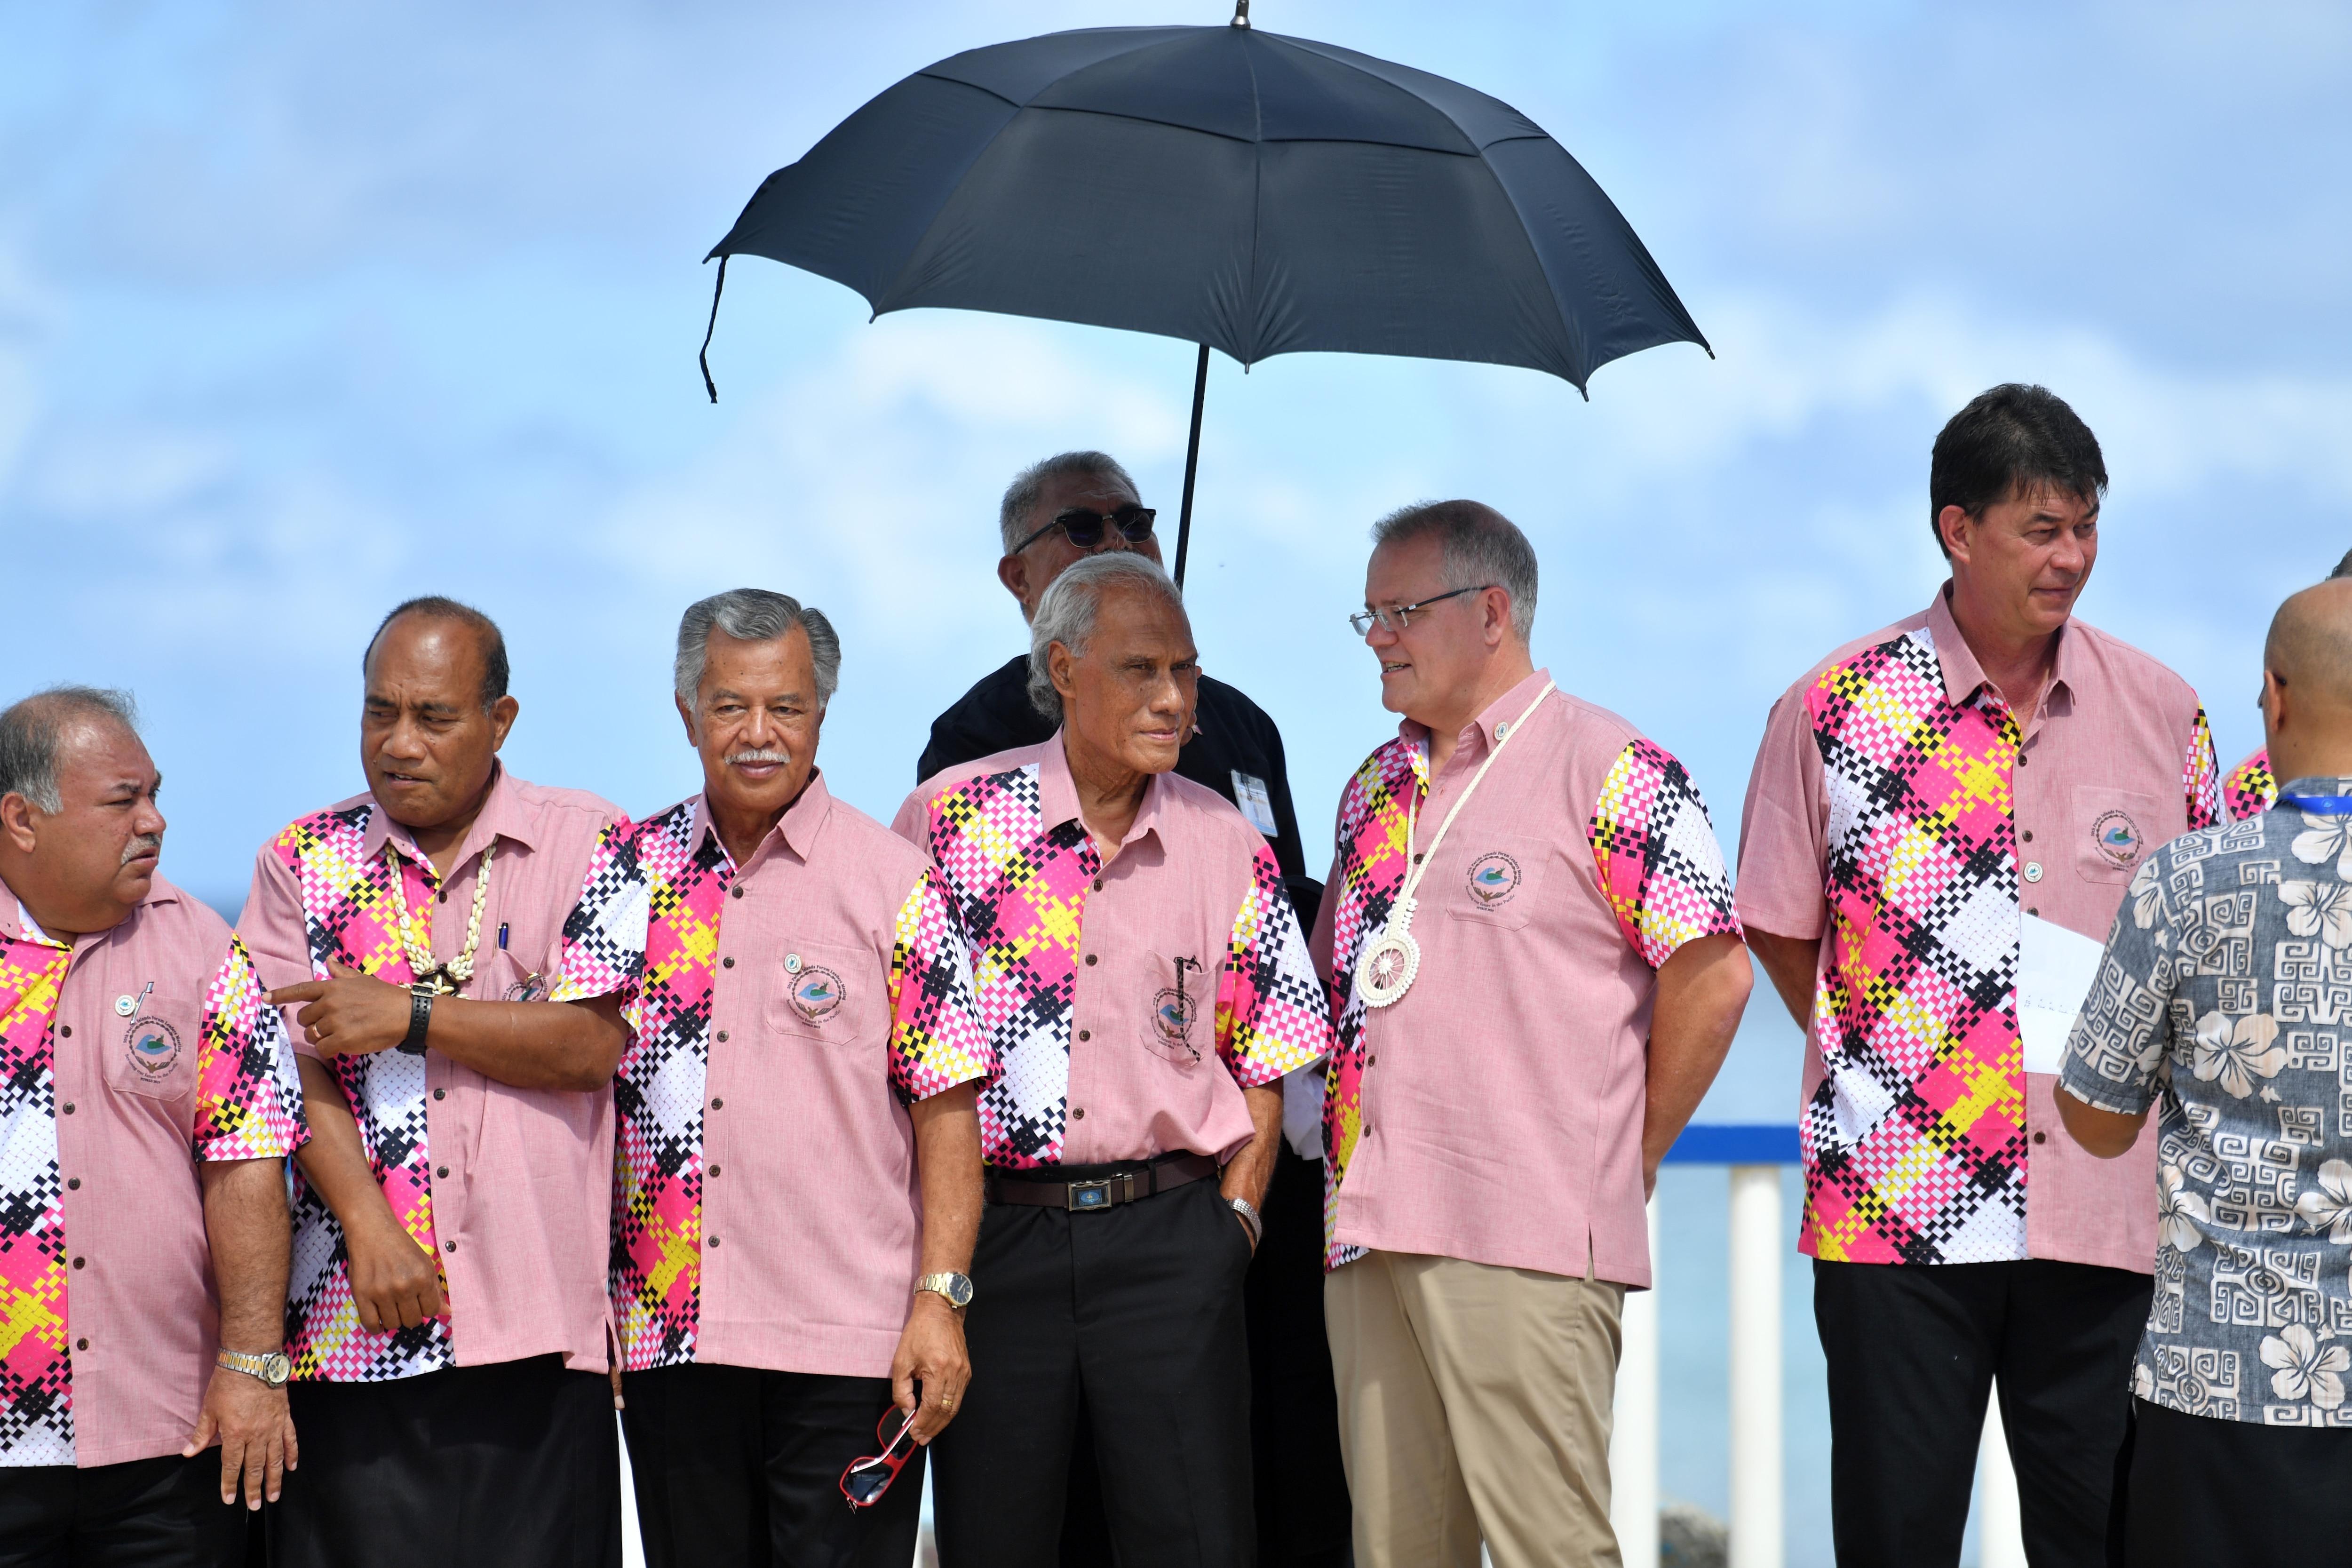 World leaders, including Scott Morrison, at the Pacific Islands Forum in Funafuti, Tuvalu.